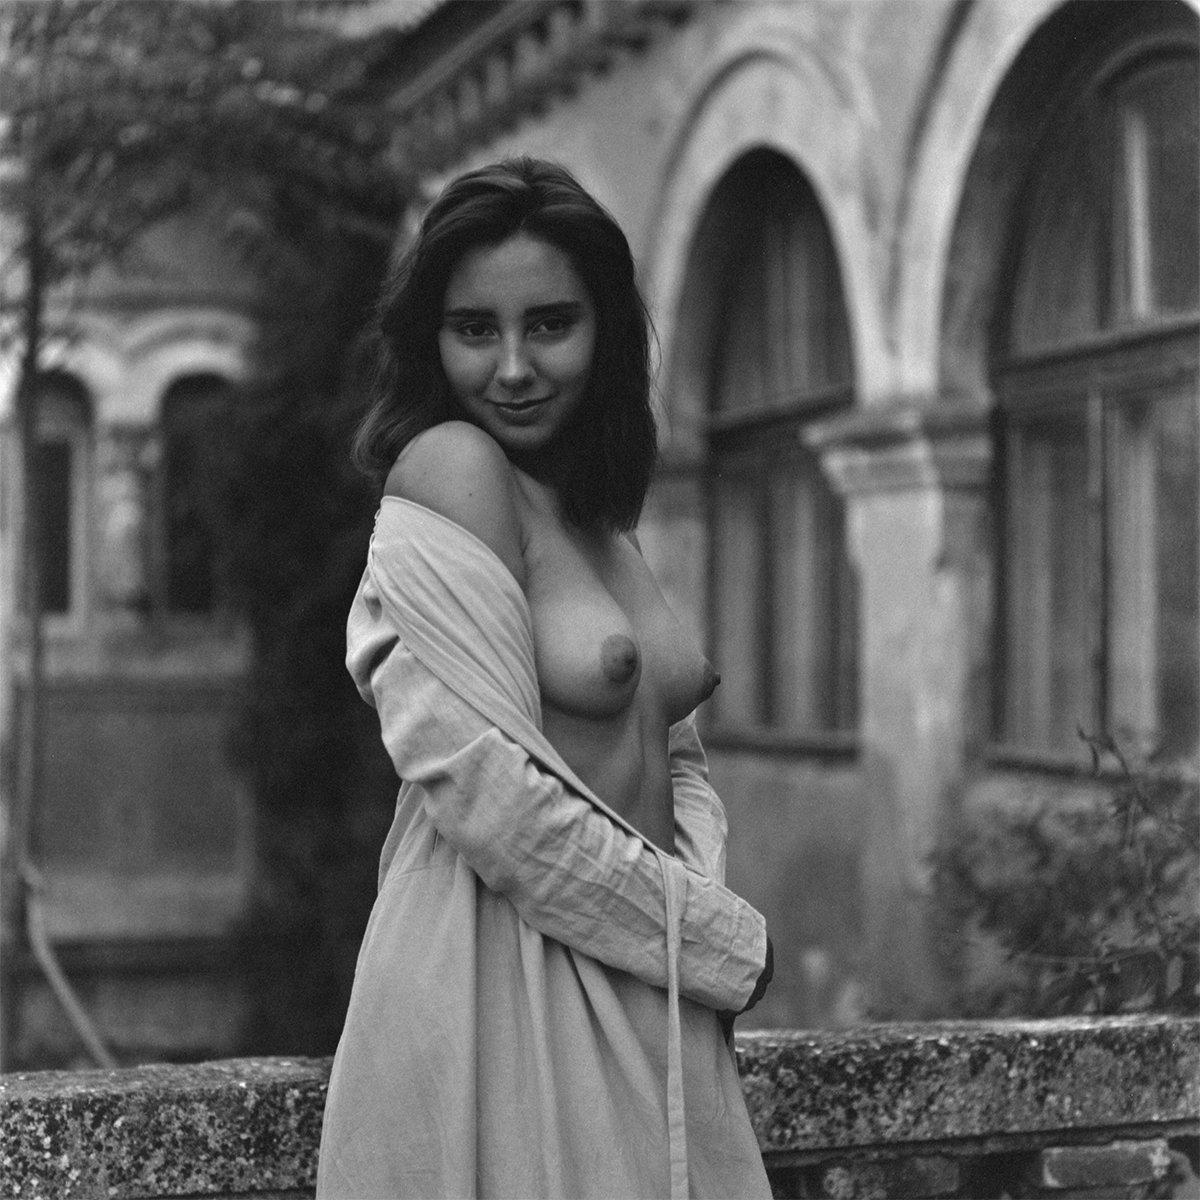 nude, nuart, ню. эротика, портрет, Юрий Хилиниченко